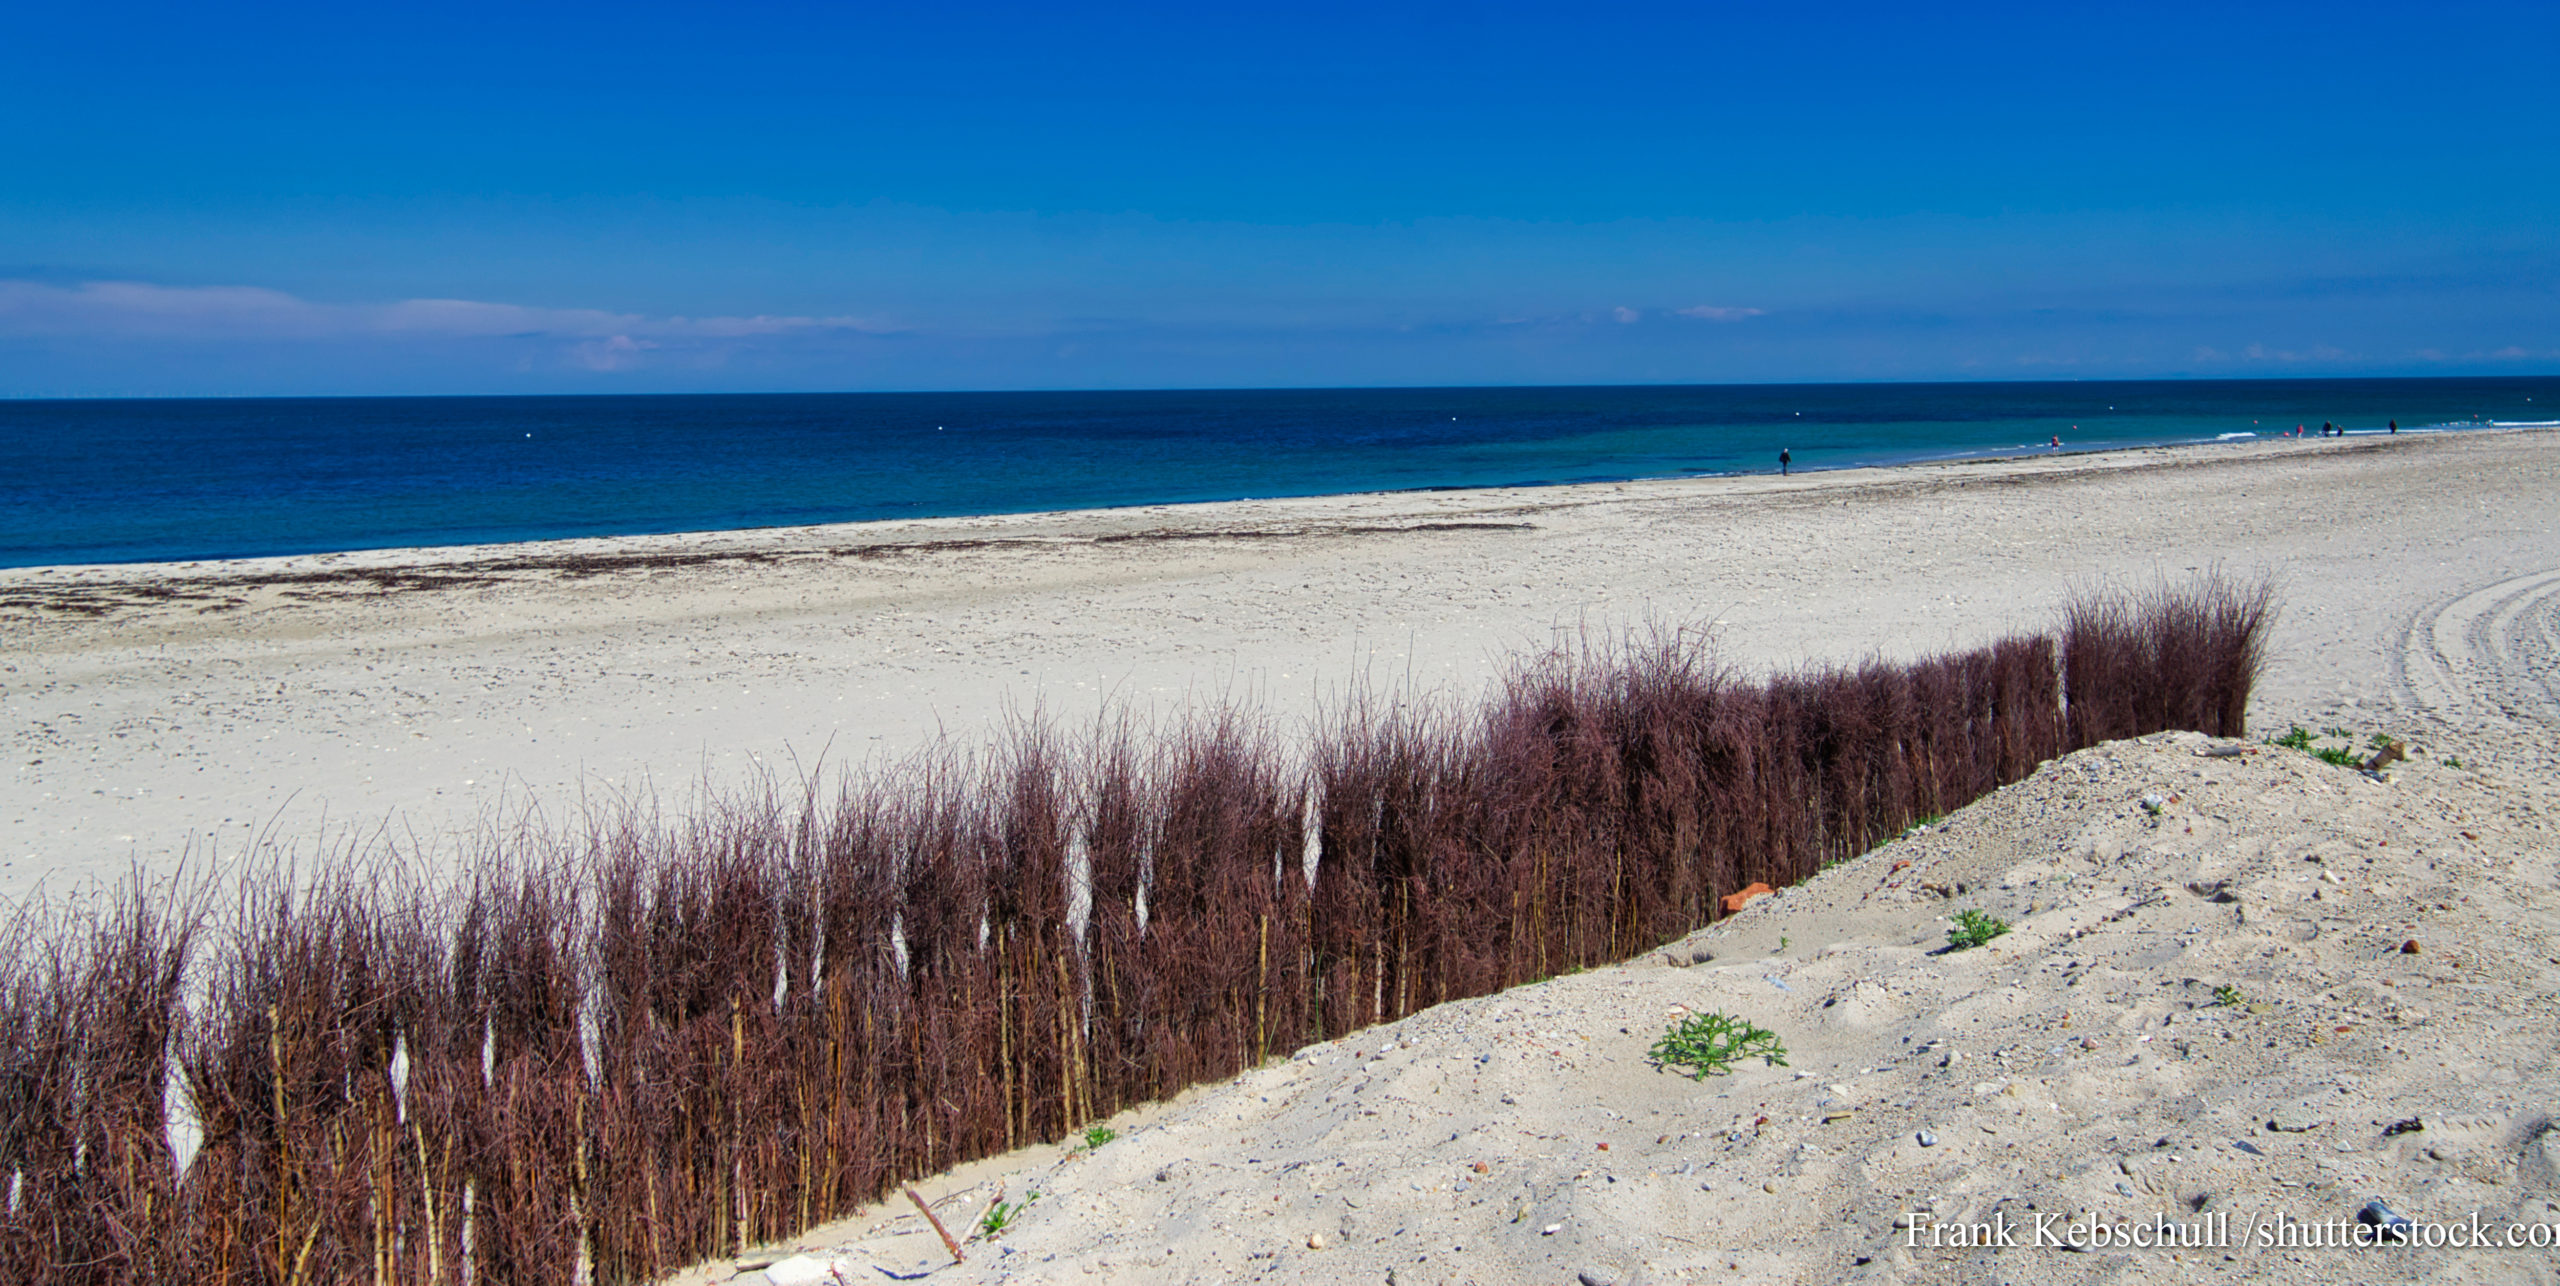 The North beach on island Dune - Heligoland - Germany